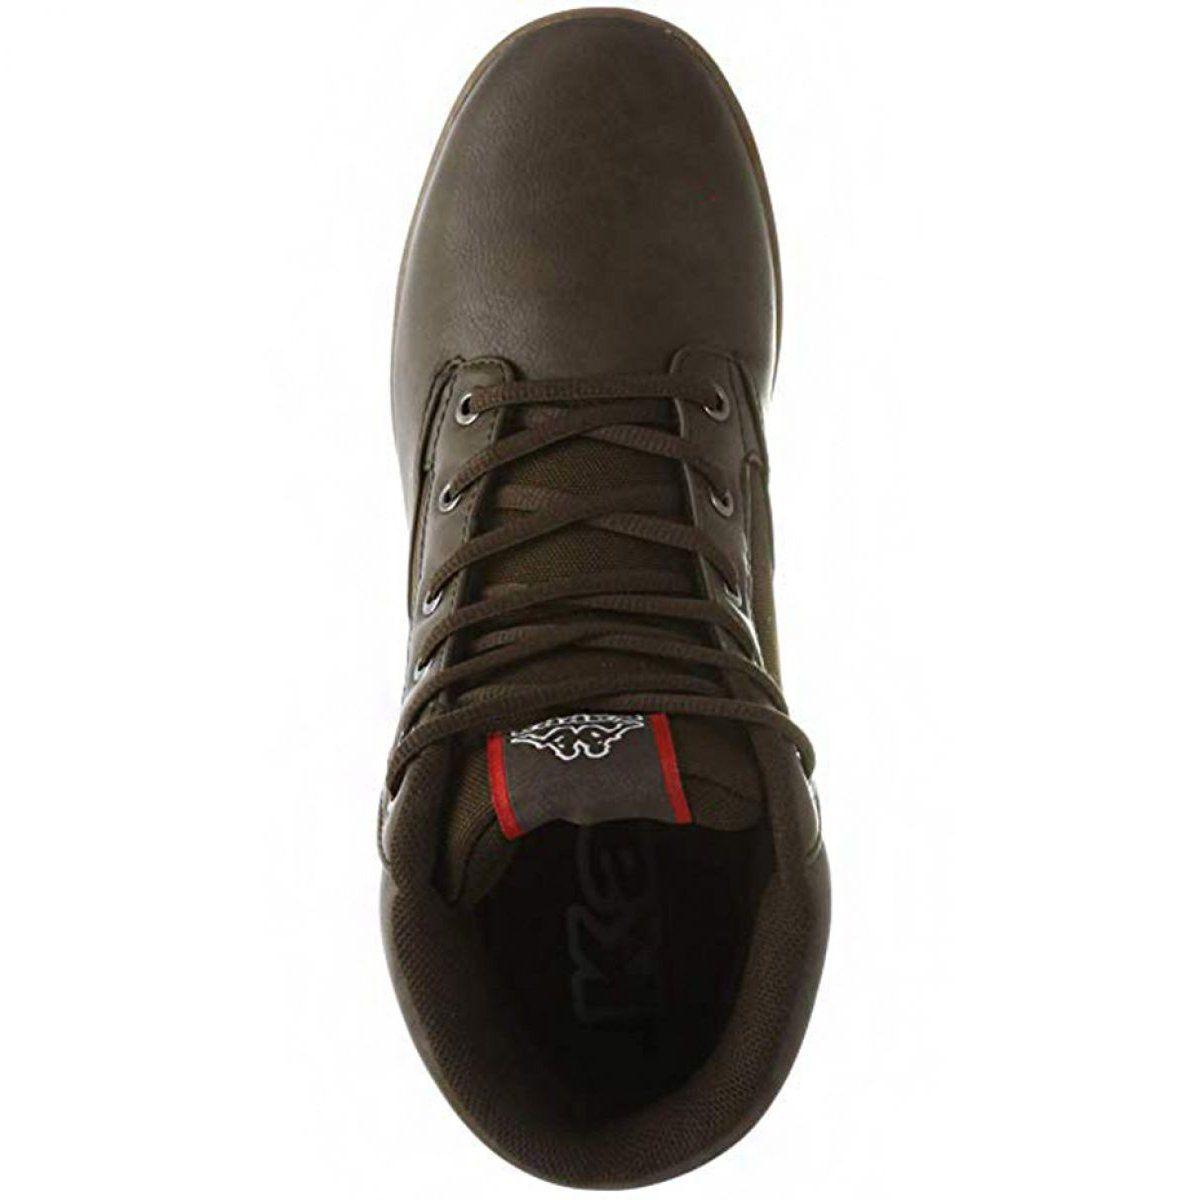 Buty Zimowe Kappa Bonfire M 242777 5050 Brazowe Winter Shoes Sport Shoes Men Shoes